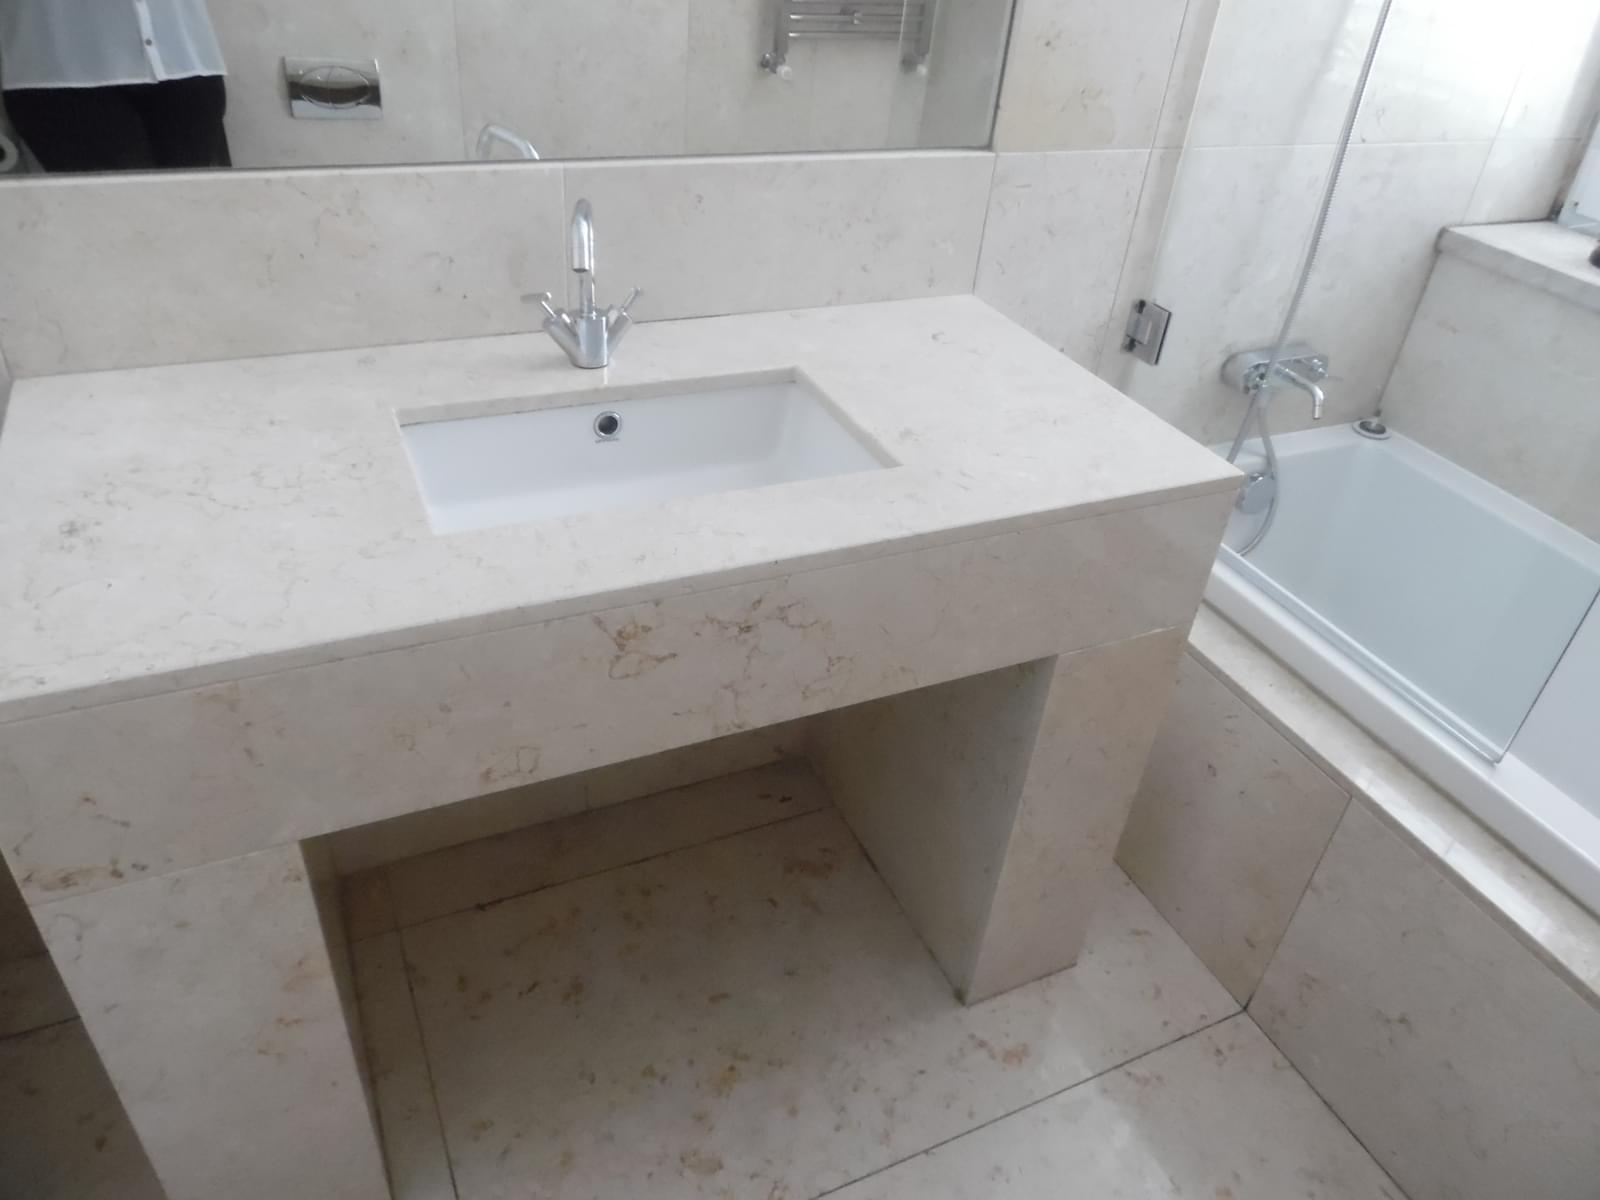 pf17454-apartamento-t4-lisboa-6bc767d5-618b-4723-8b0a-edcafeeb0d0e